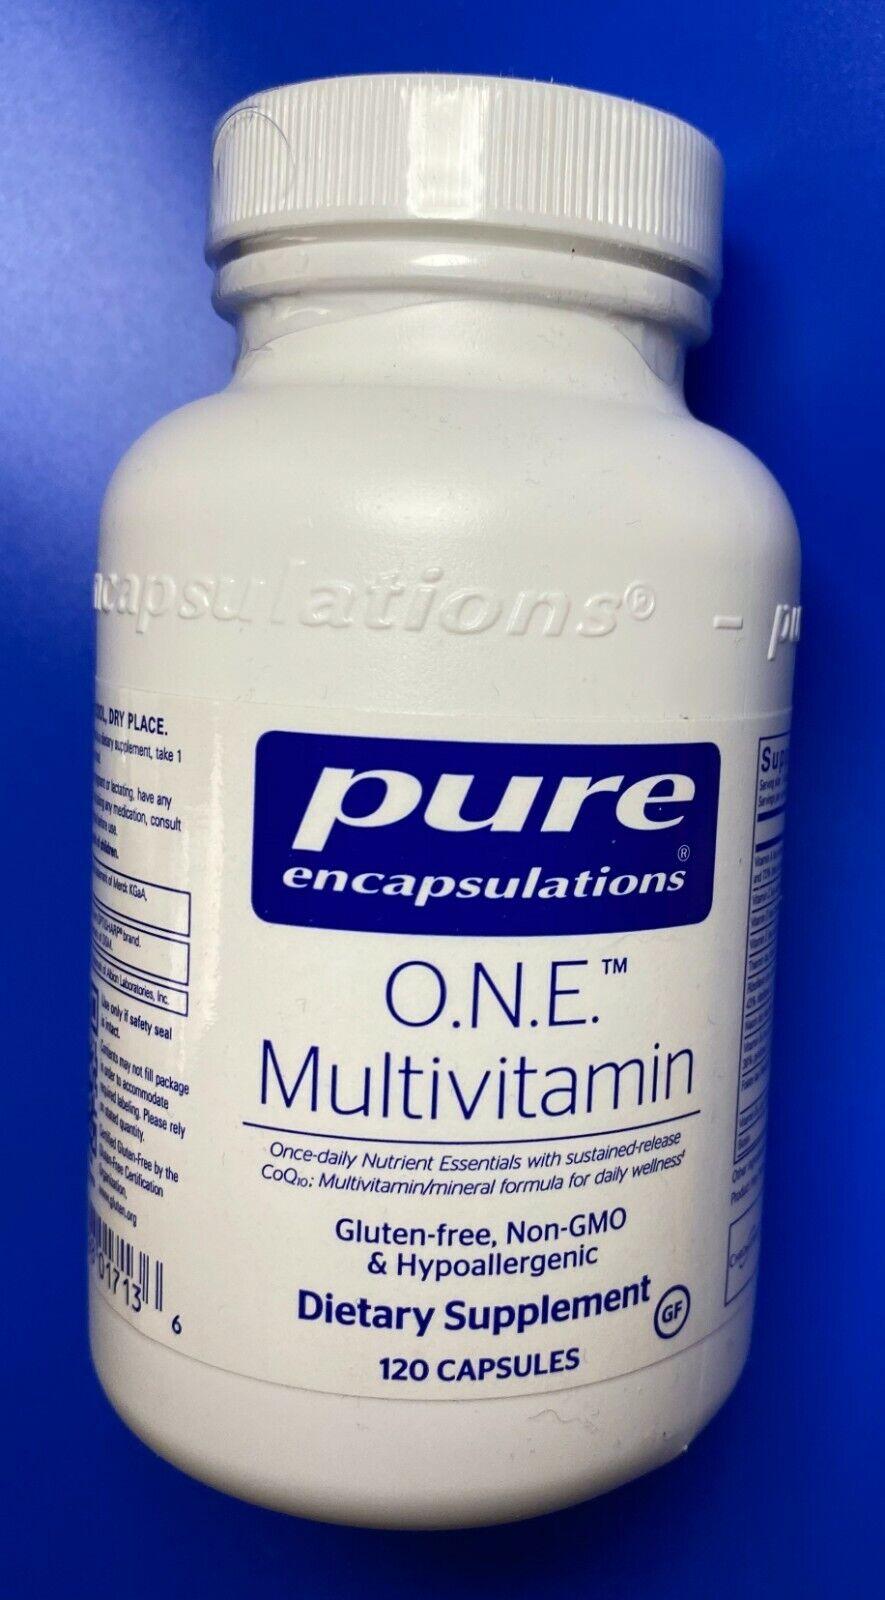 NEW & FRESH 4/22 Pure Encapsulations O.N.E. Multivitamin 120 caps FREE SHIPPING